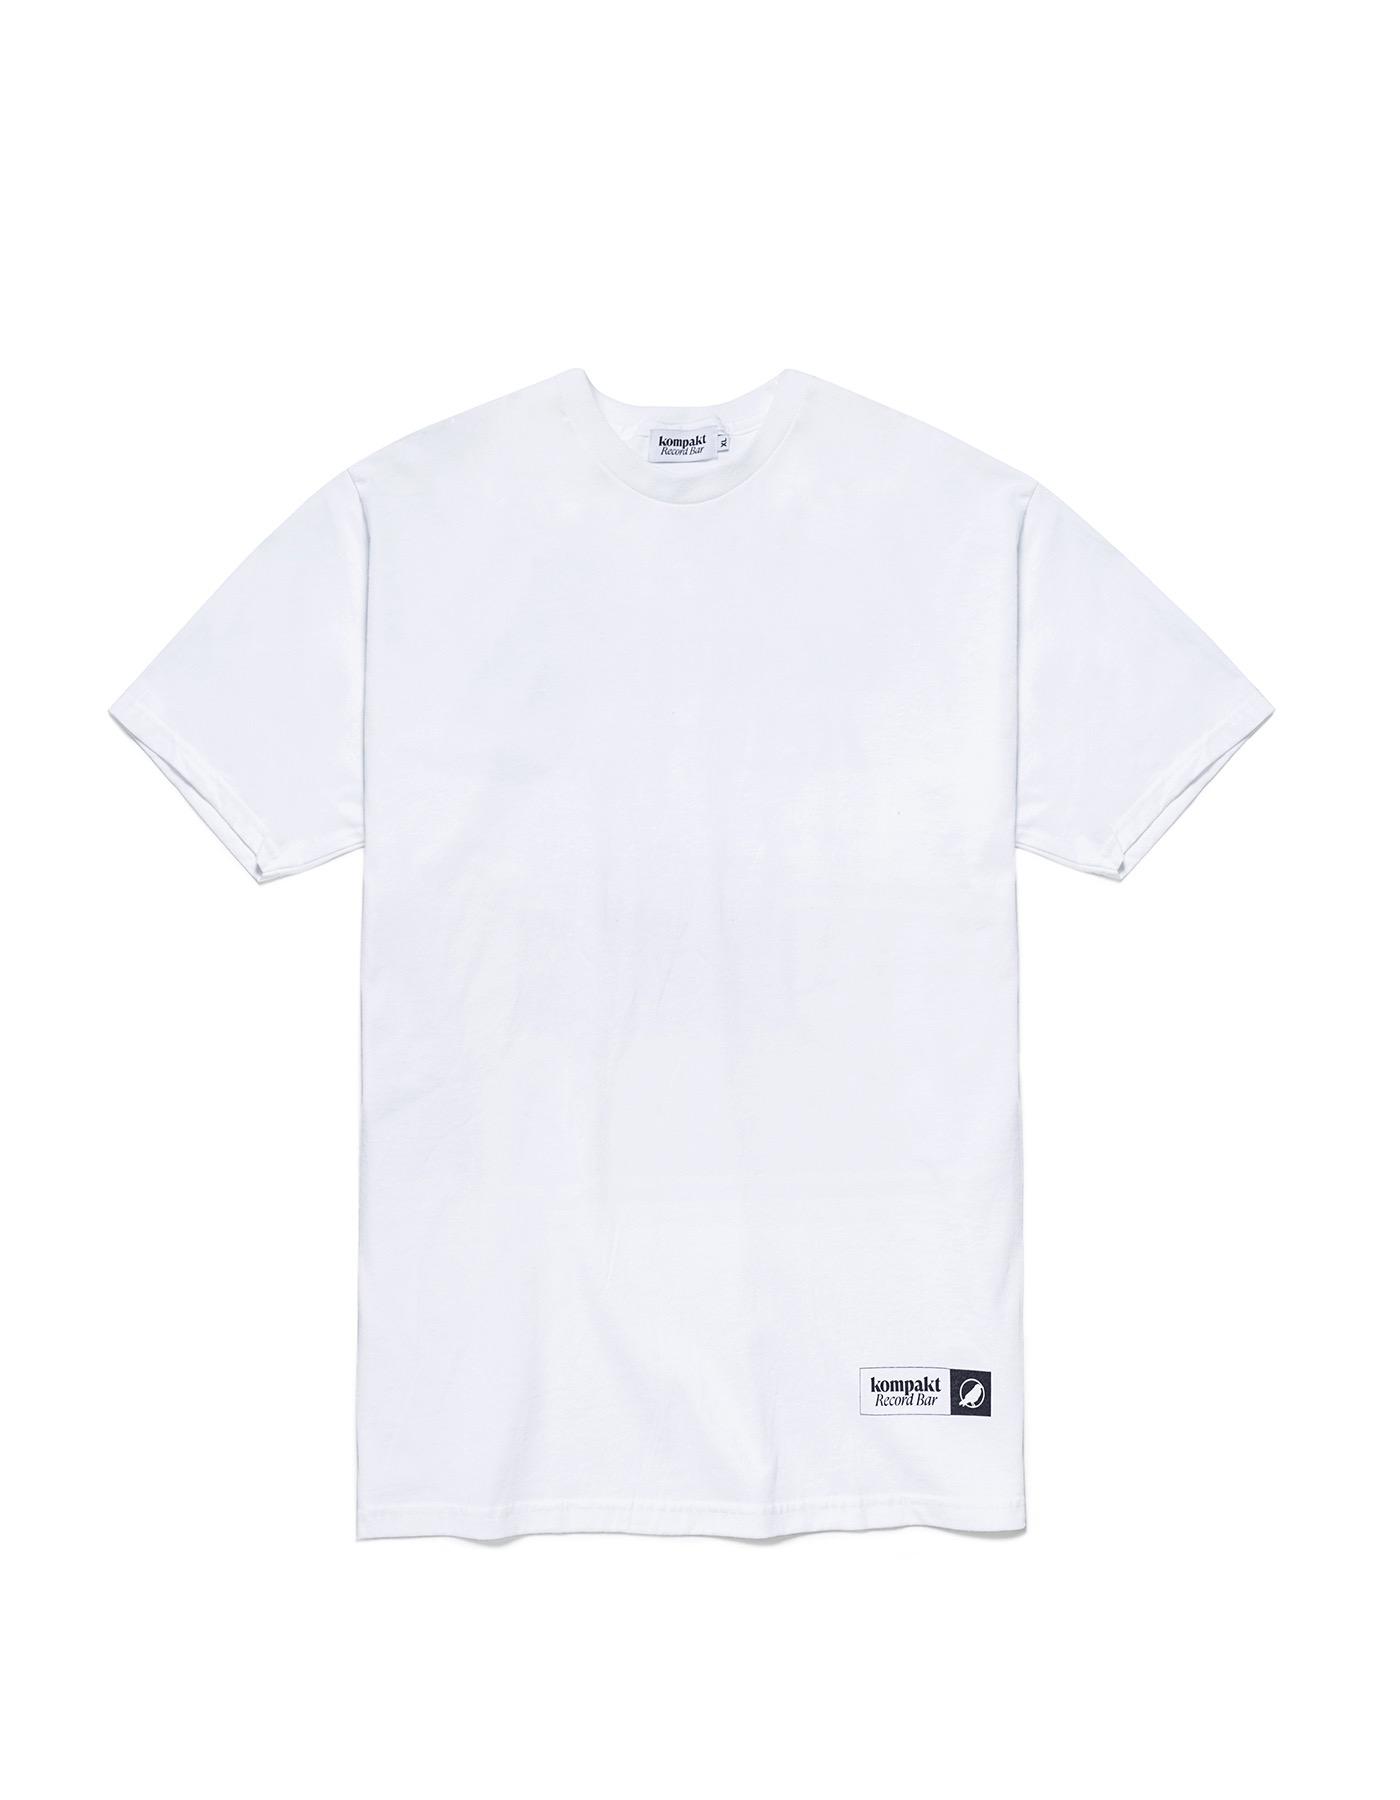 KRB X Crowcanyonhome Marble T-shirts - White